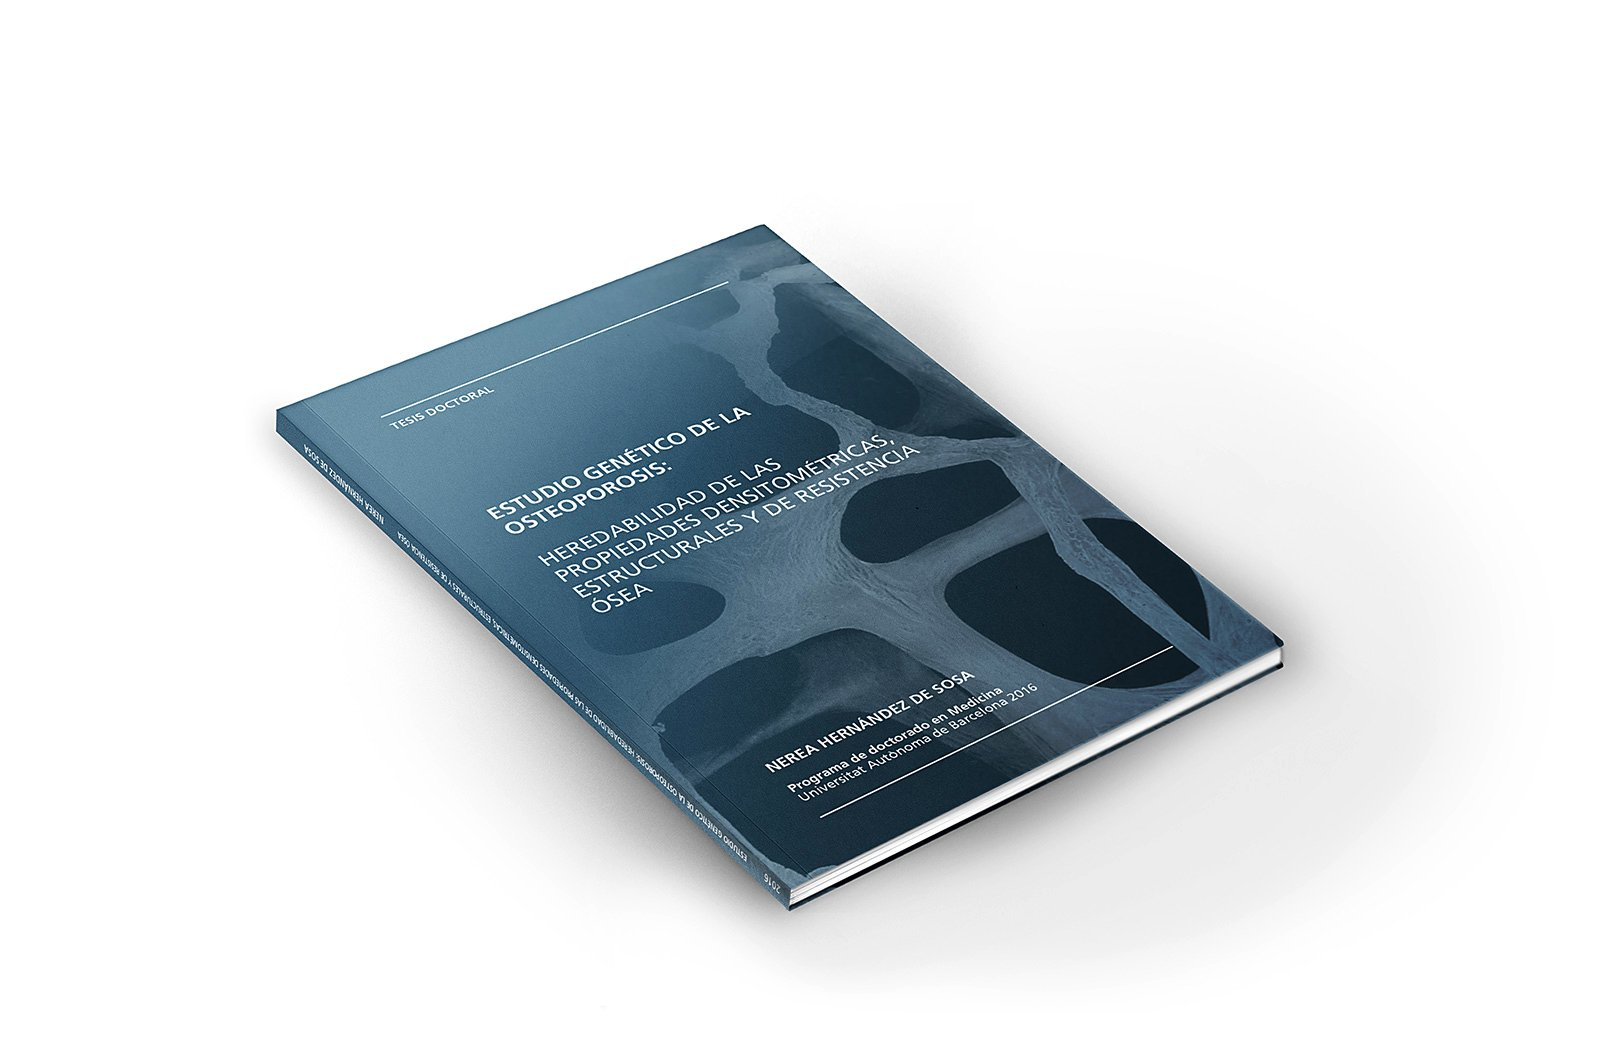 Portada de tesi doctoral de N. Hernández de Sosa